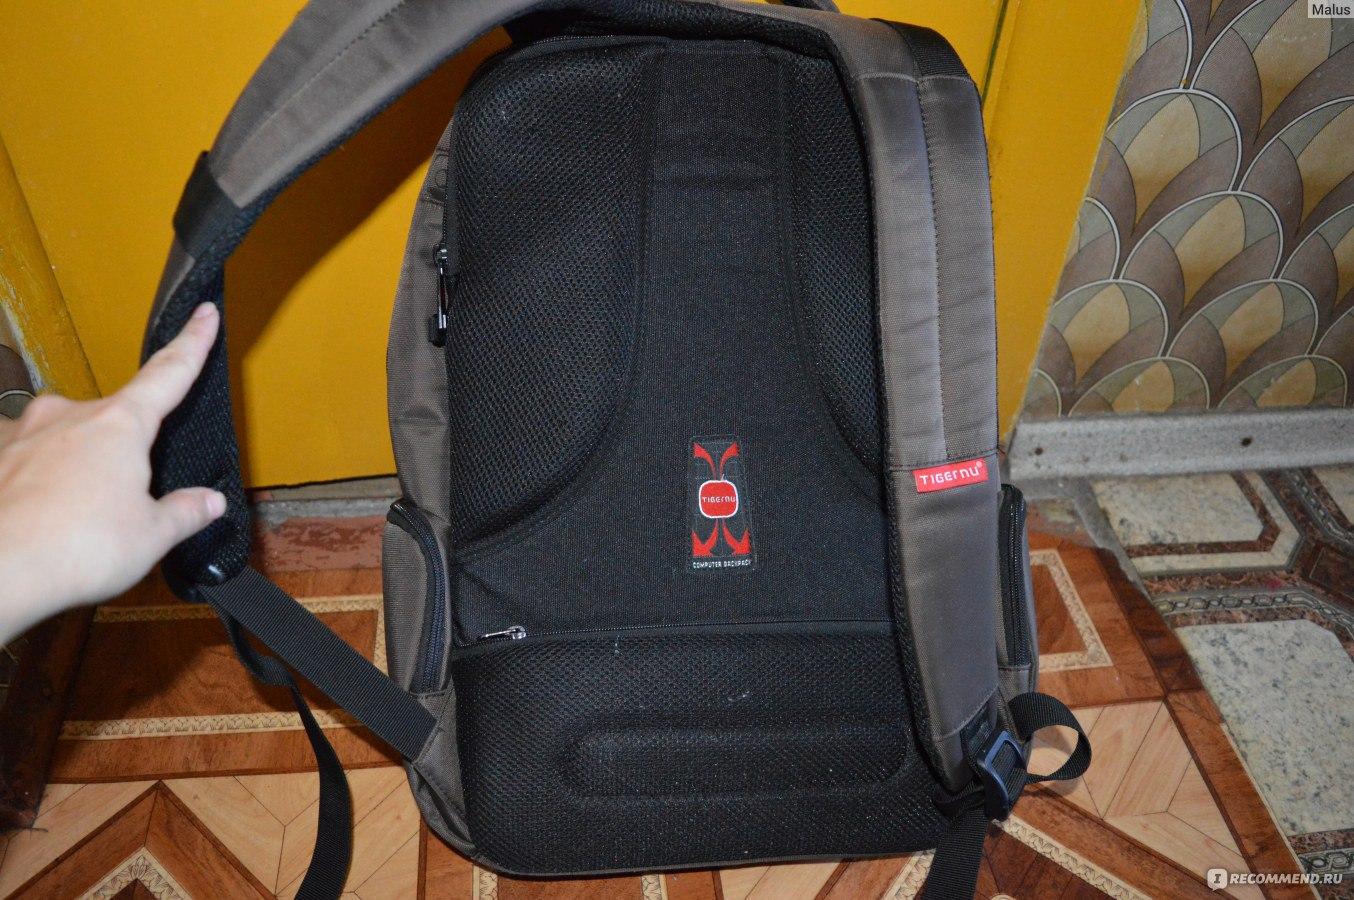 Пластмассовые штучки на лямках рюкзака tt 7599.032 tt range pack g-82 l рюкзак flecktarn